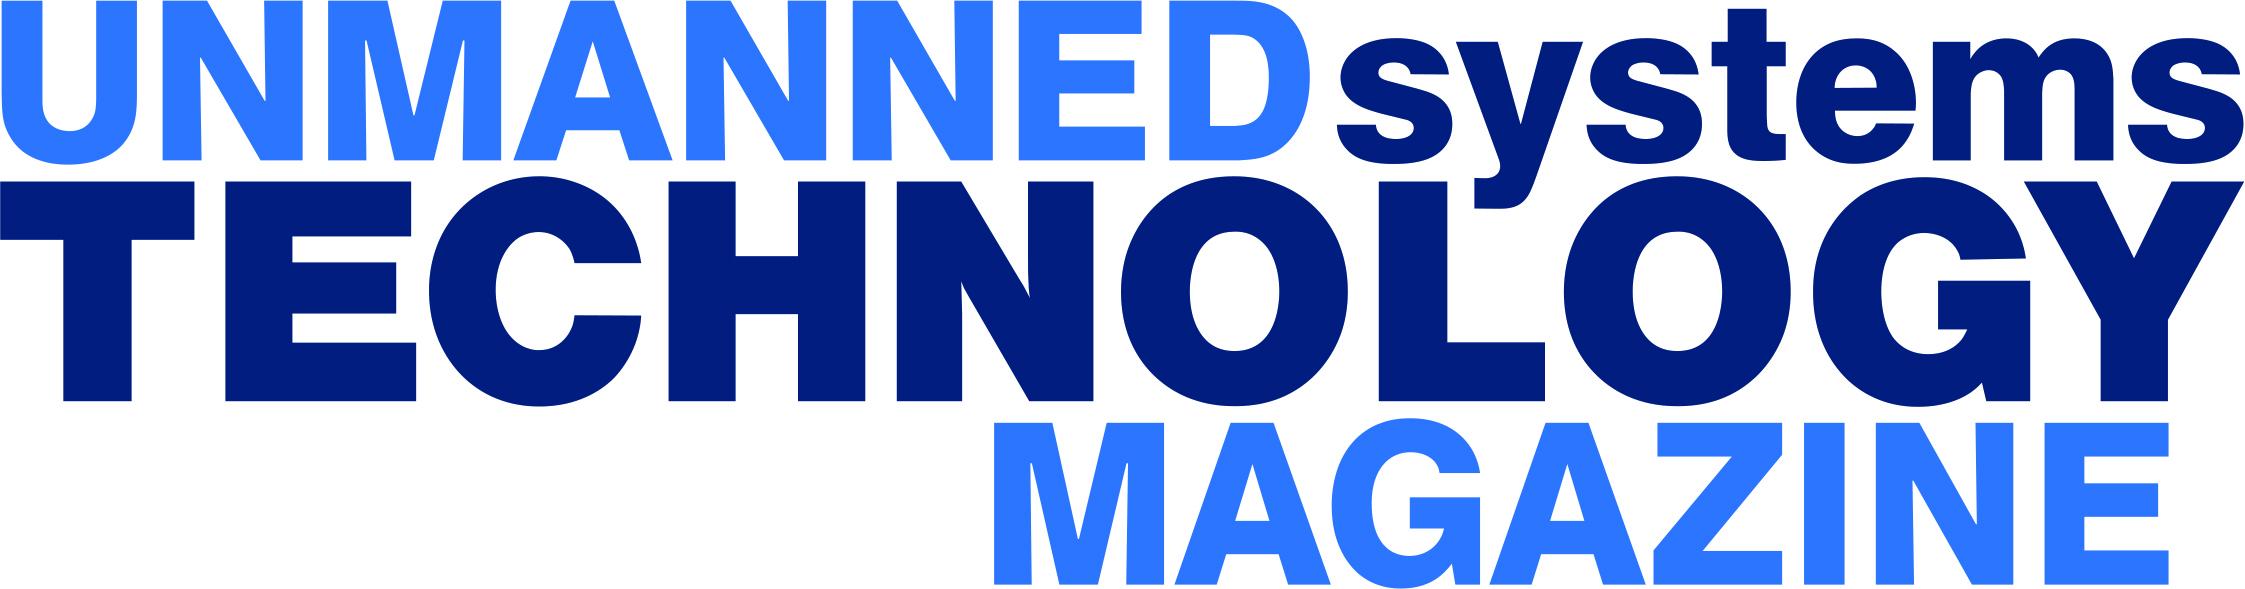 UST Logo_Magazine